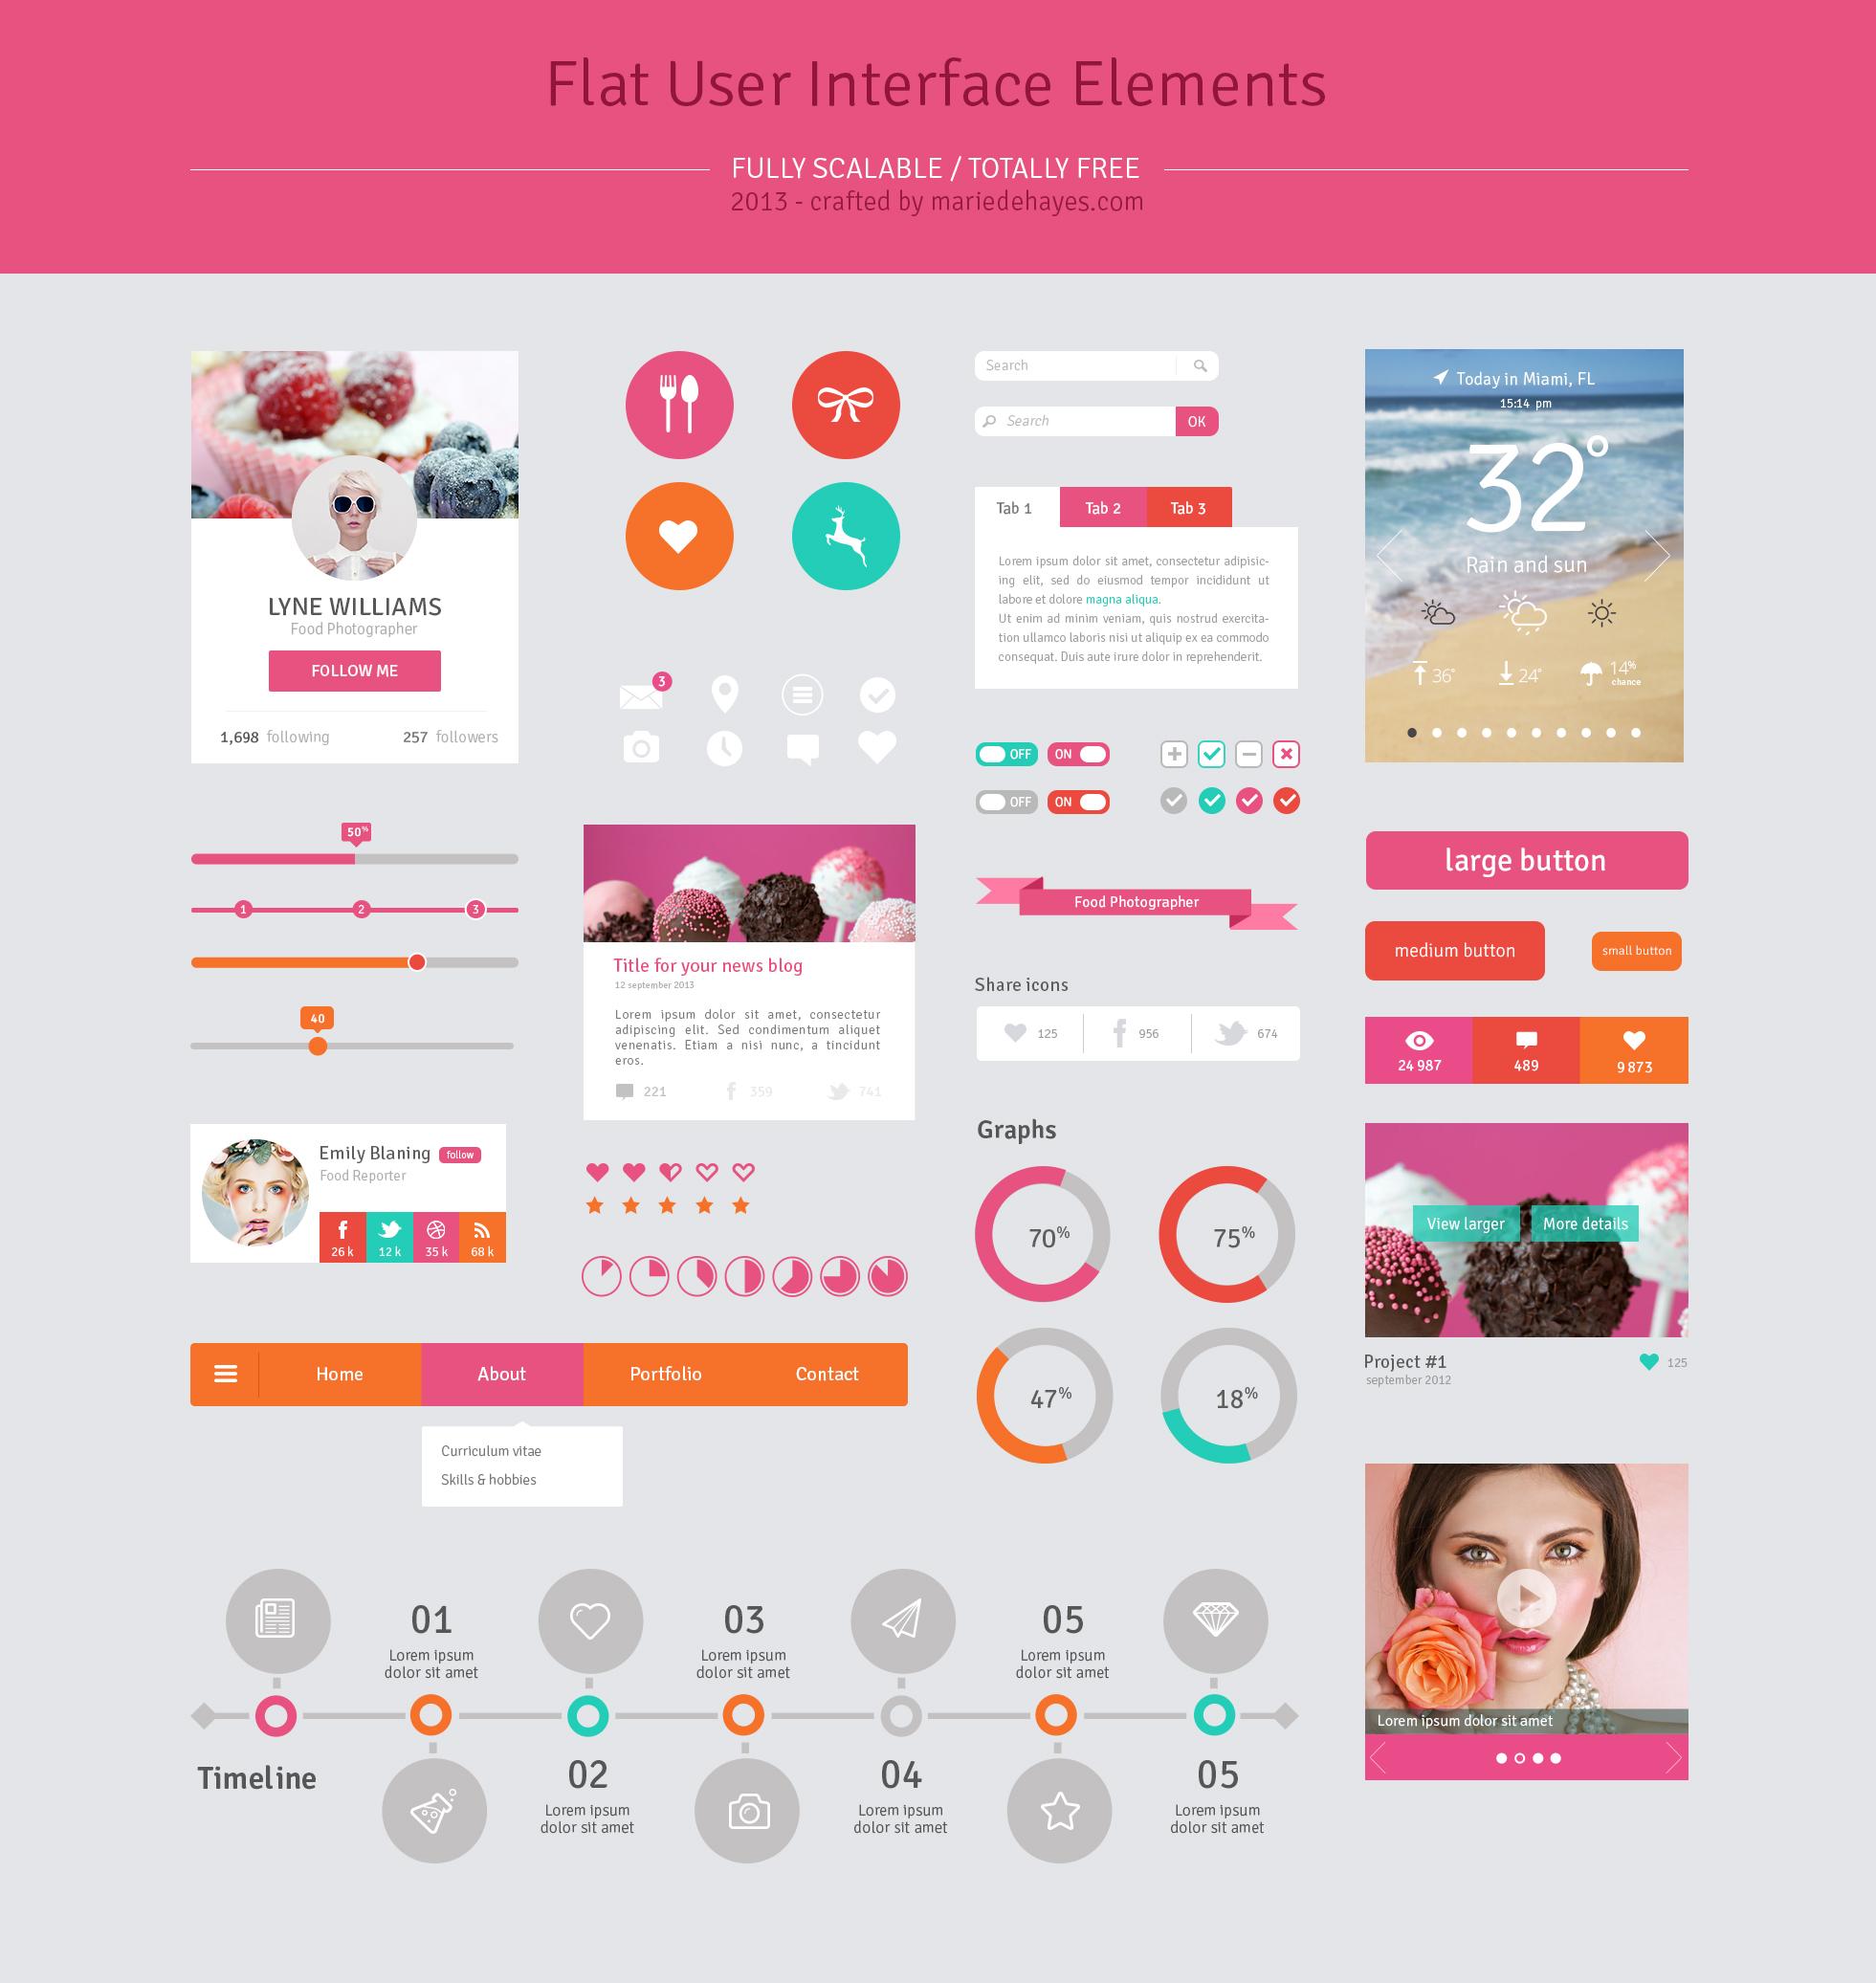 9 Flat UI Design Elements Images